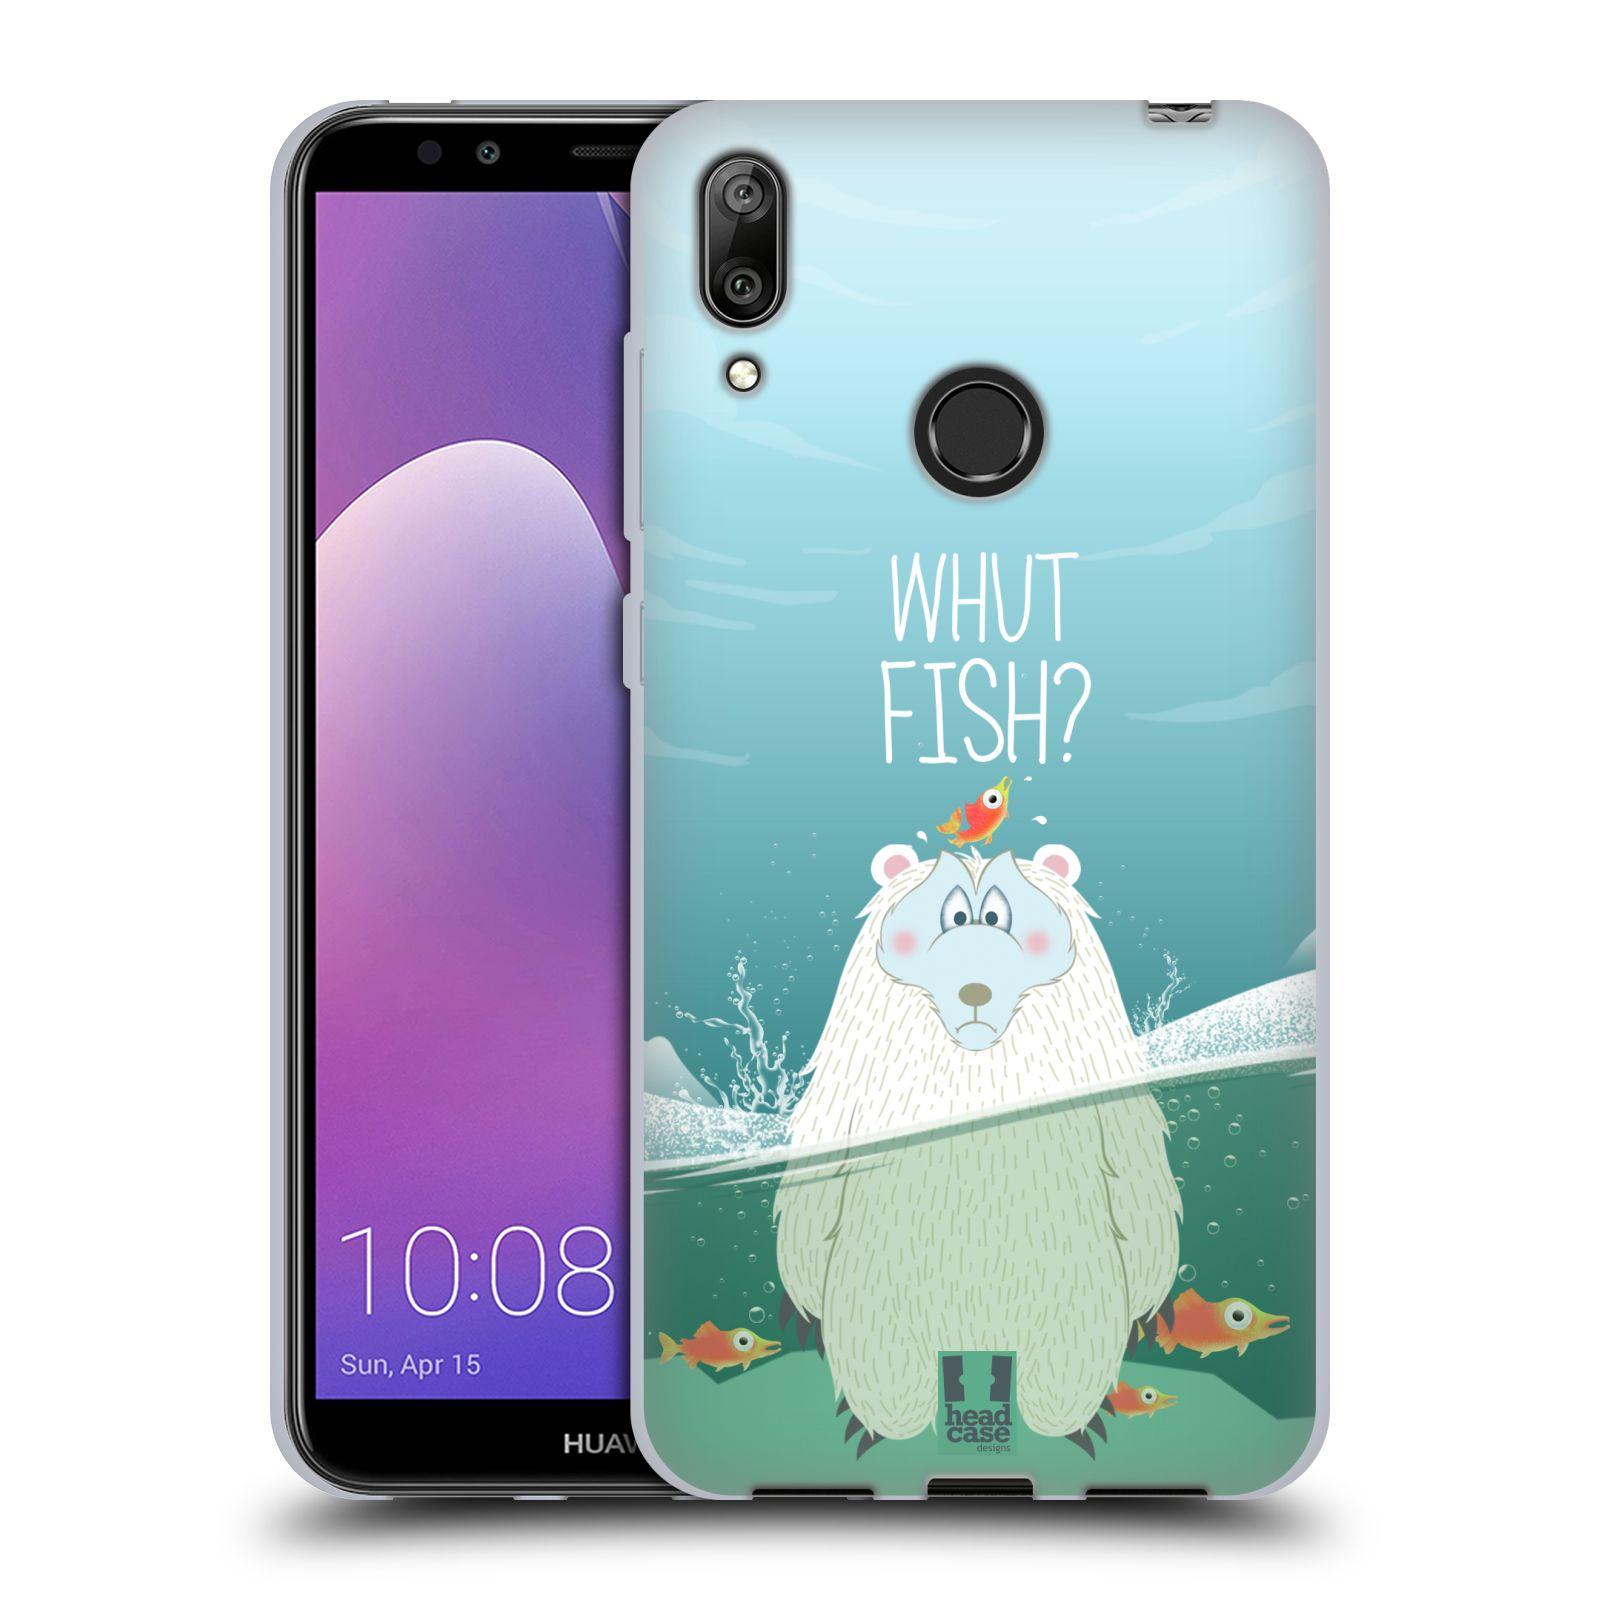 Silikonové pouzdro na mobil Huawei Y7 (2019) - Head Case - Medvěd Whut Fish?